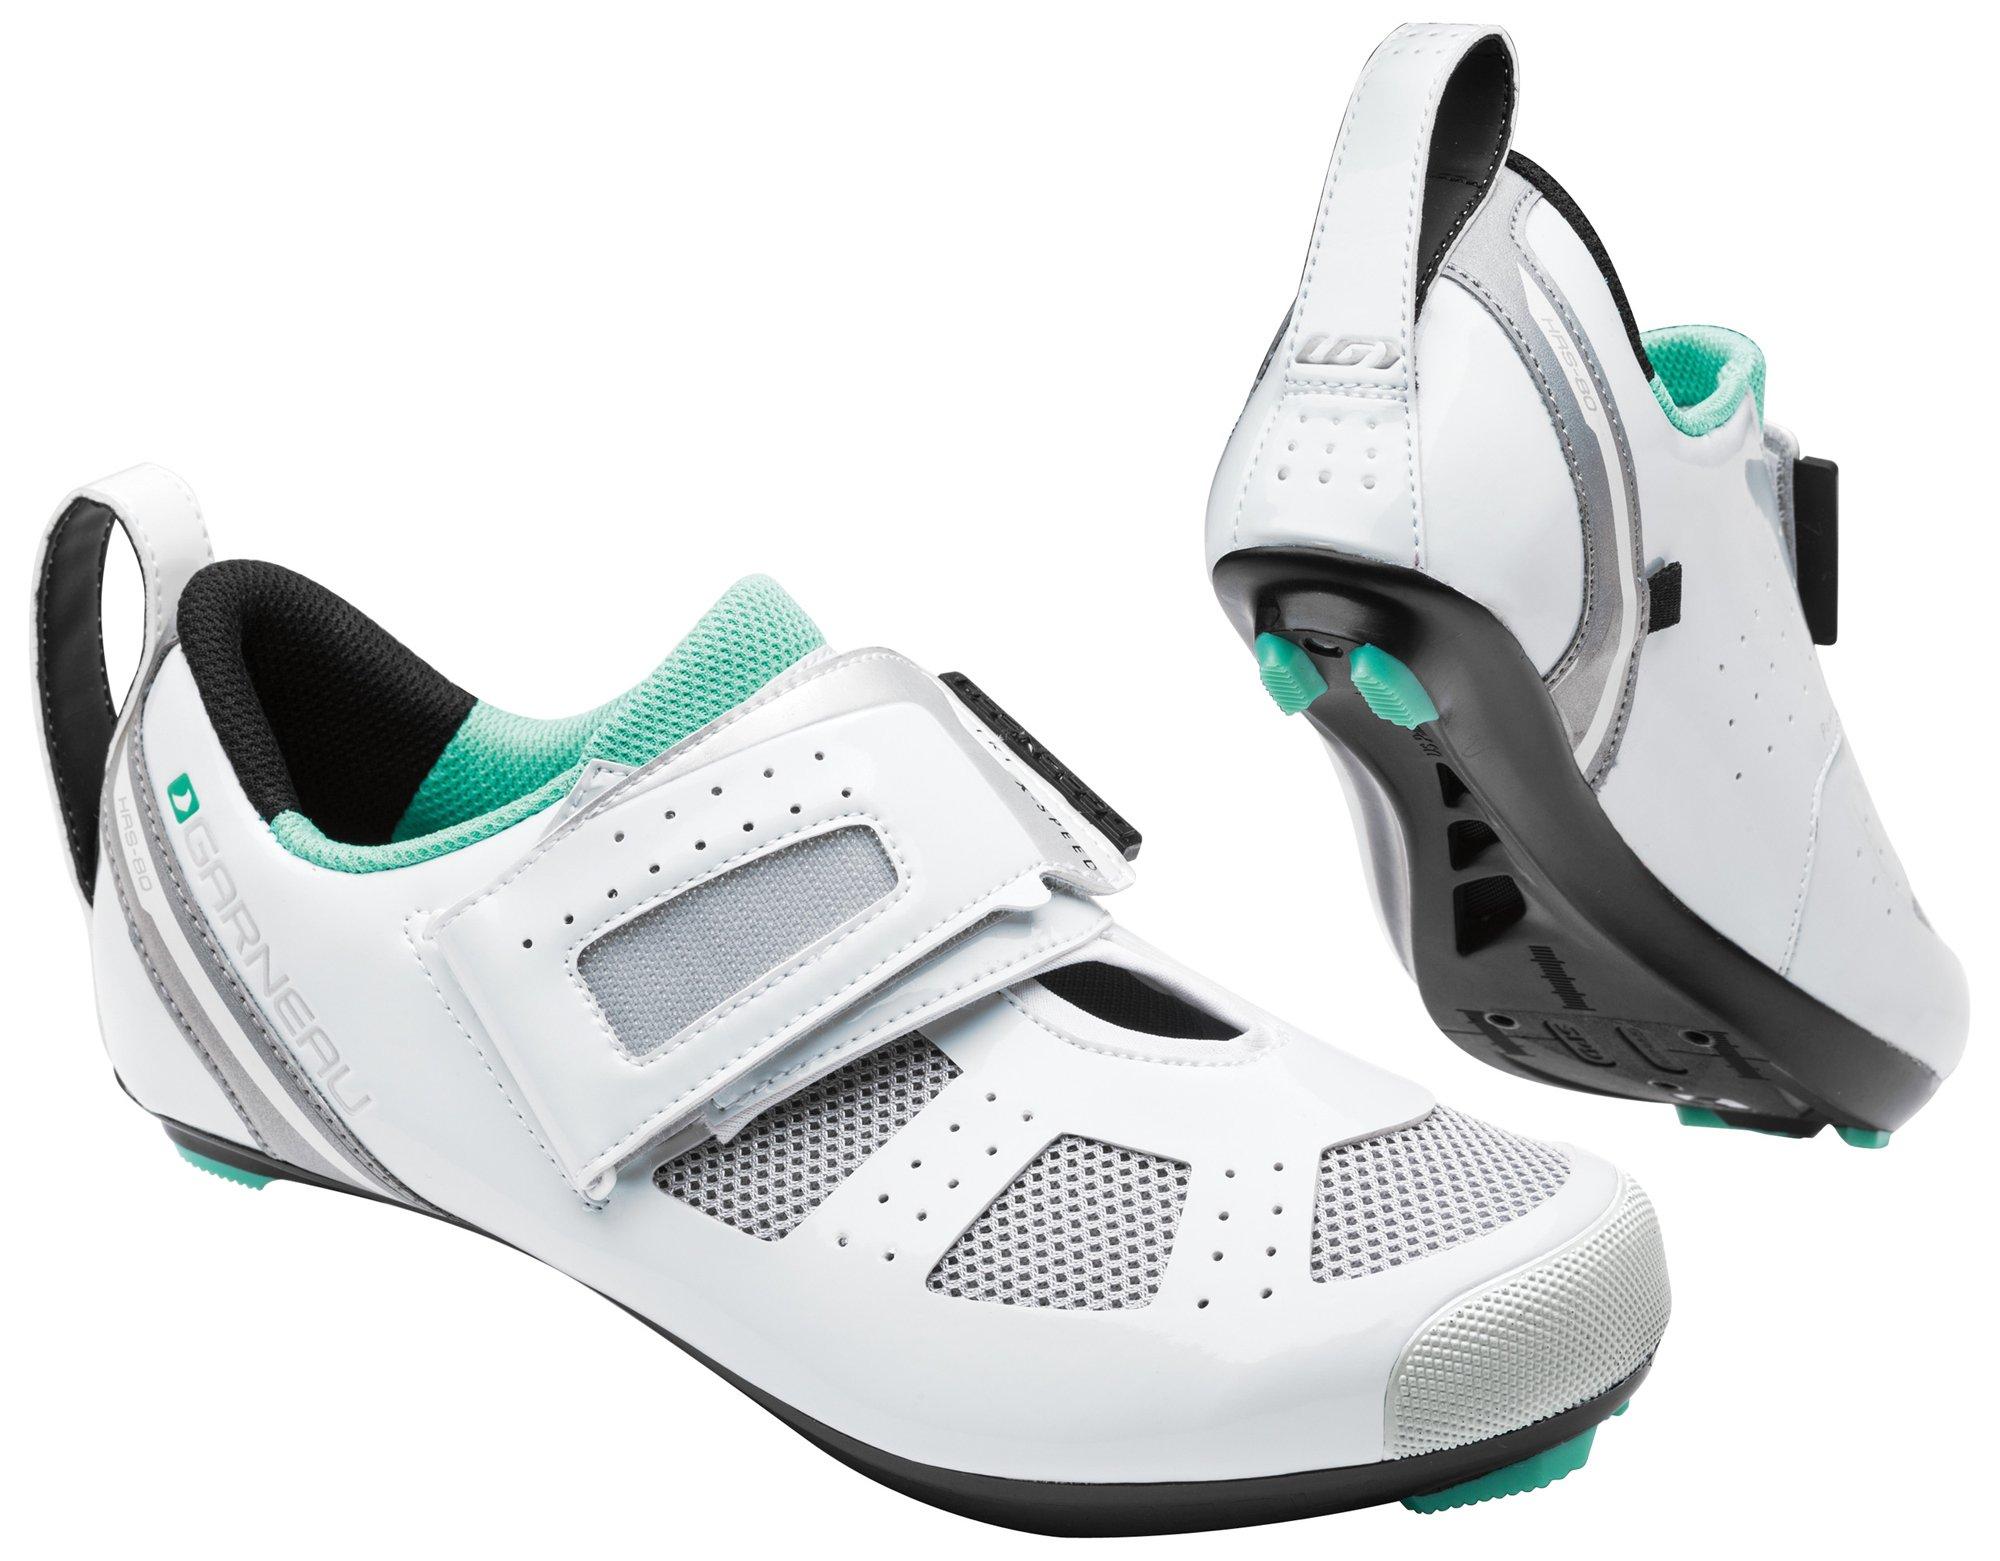 Louis Garneau - Women's Tri X-Speed 3 Triathlon Bike Shoes, White/Mojito, 38